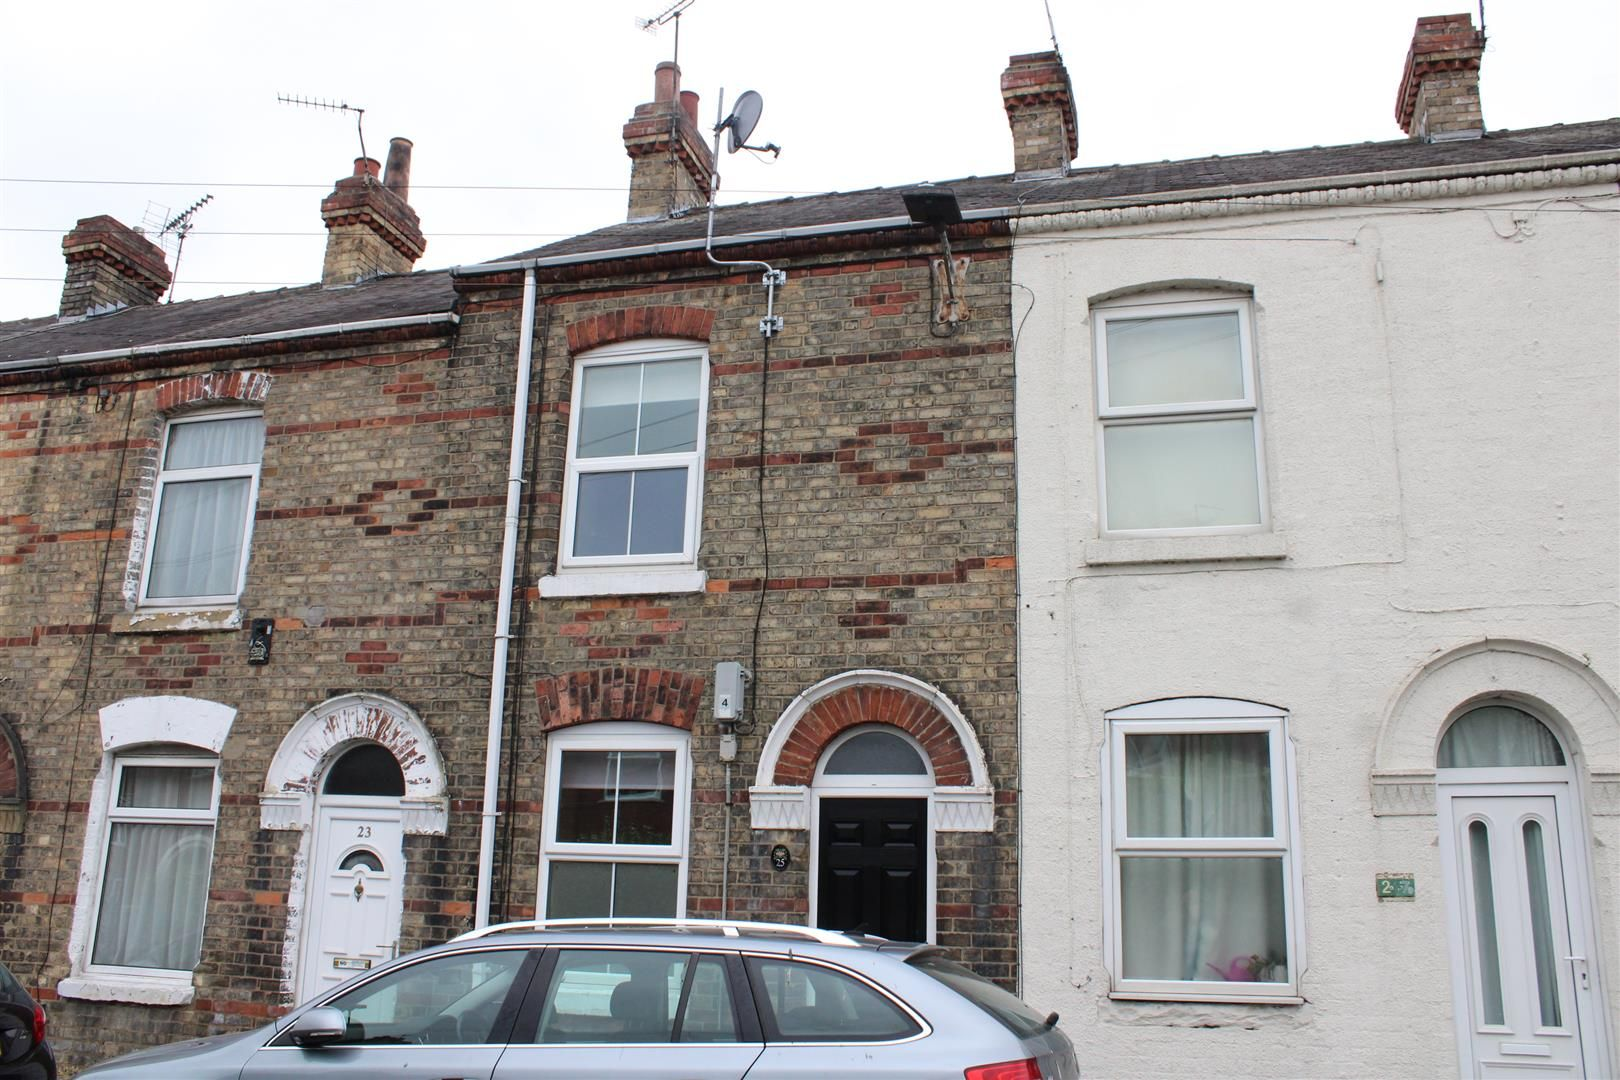 Property photo 1 of 14. Img_3633.Jpg